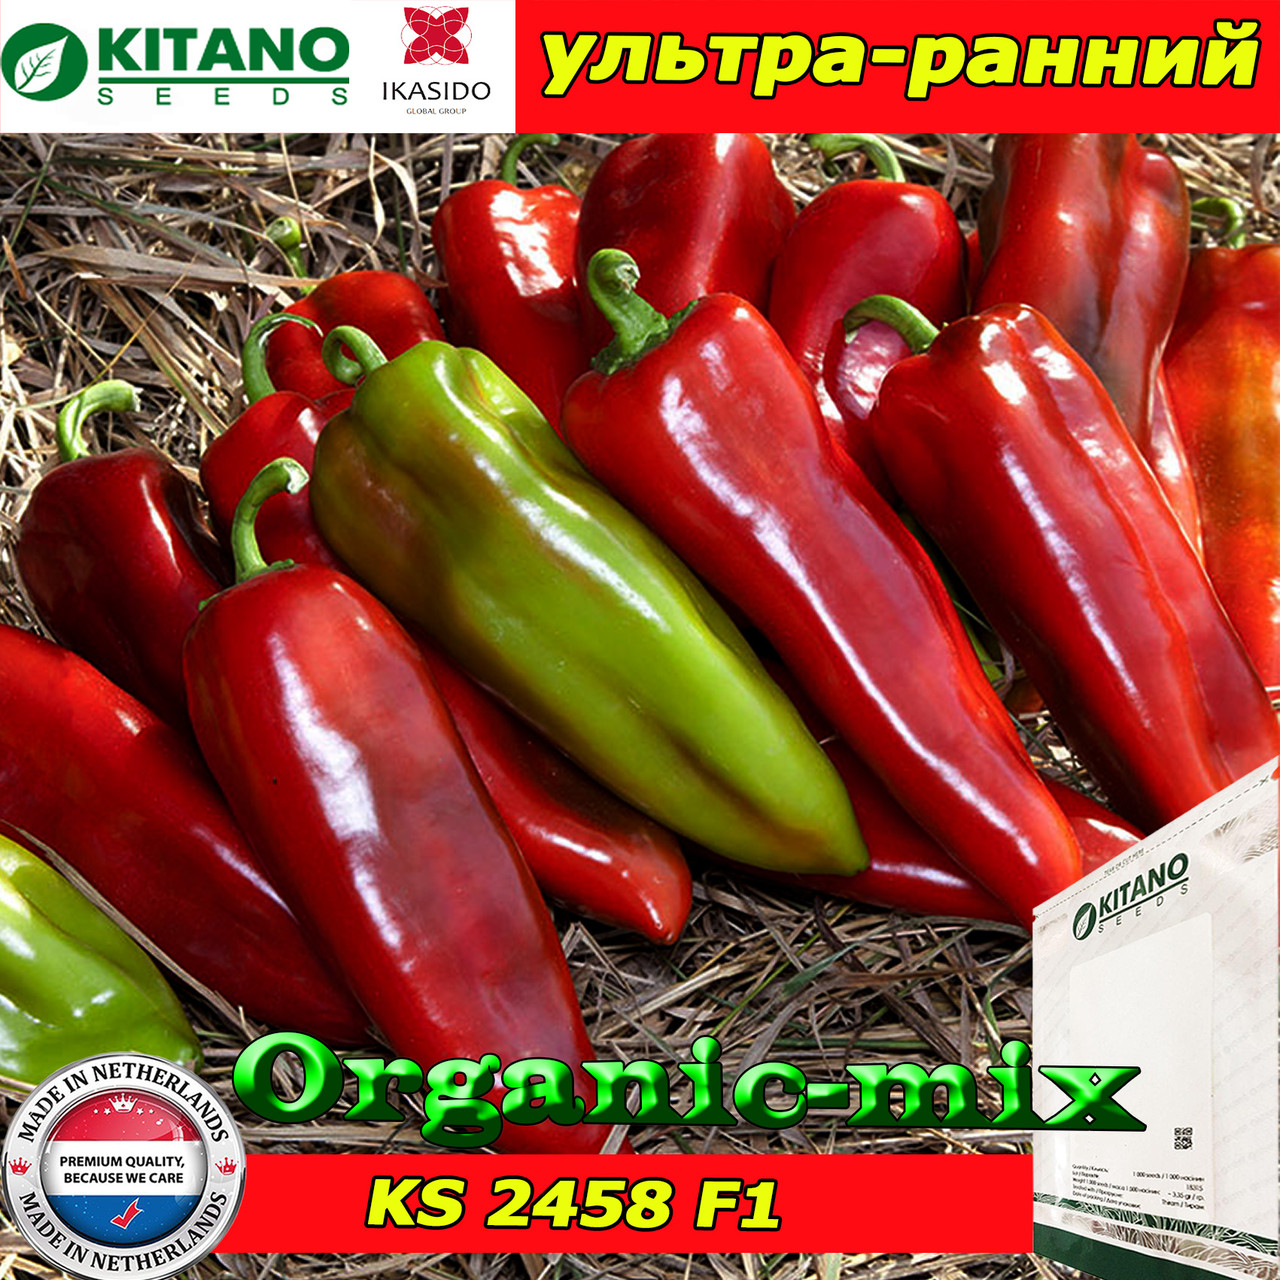 Капия KS 2458 F1, семена сладкого перца, пакет 1000 семян ТМ Kitano Seeds (Нидерланды)